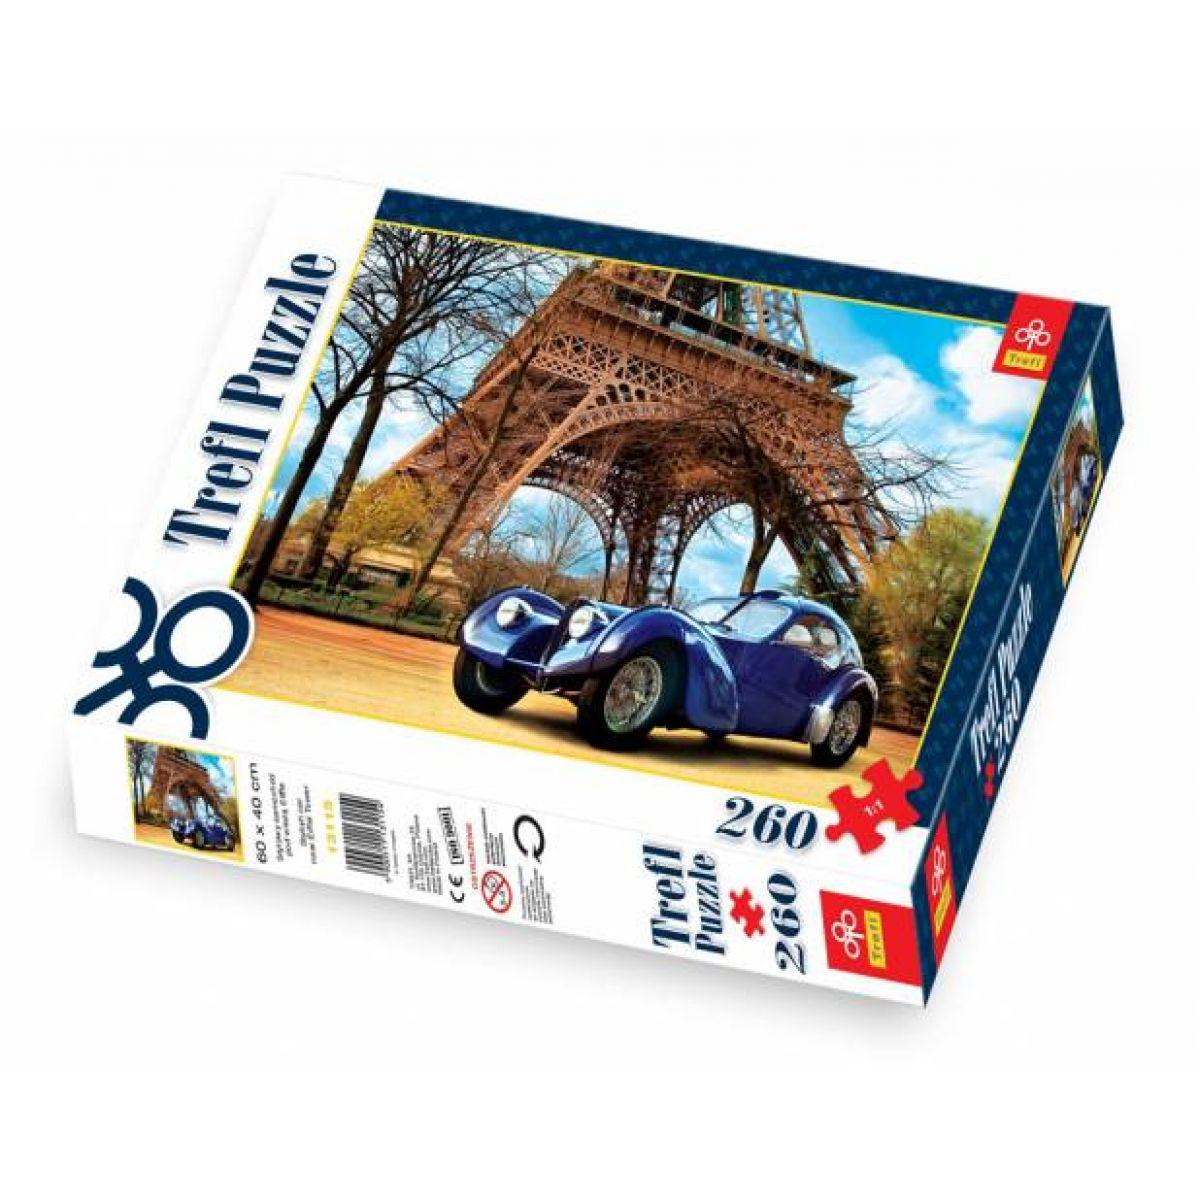 Trefl Puzzle Auto u Eiffelovi věže 260 dílků